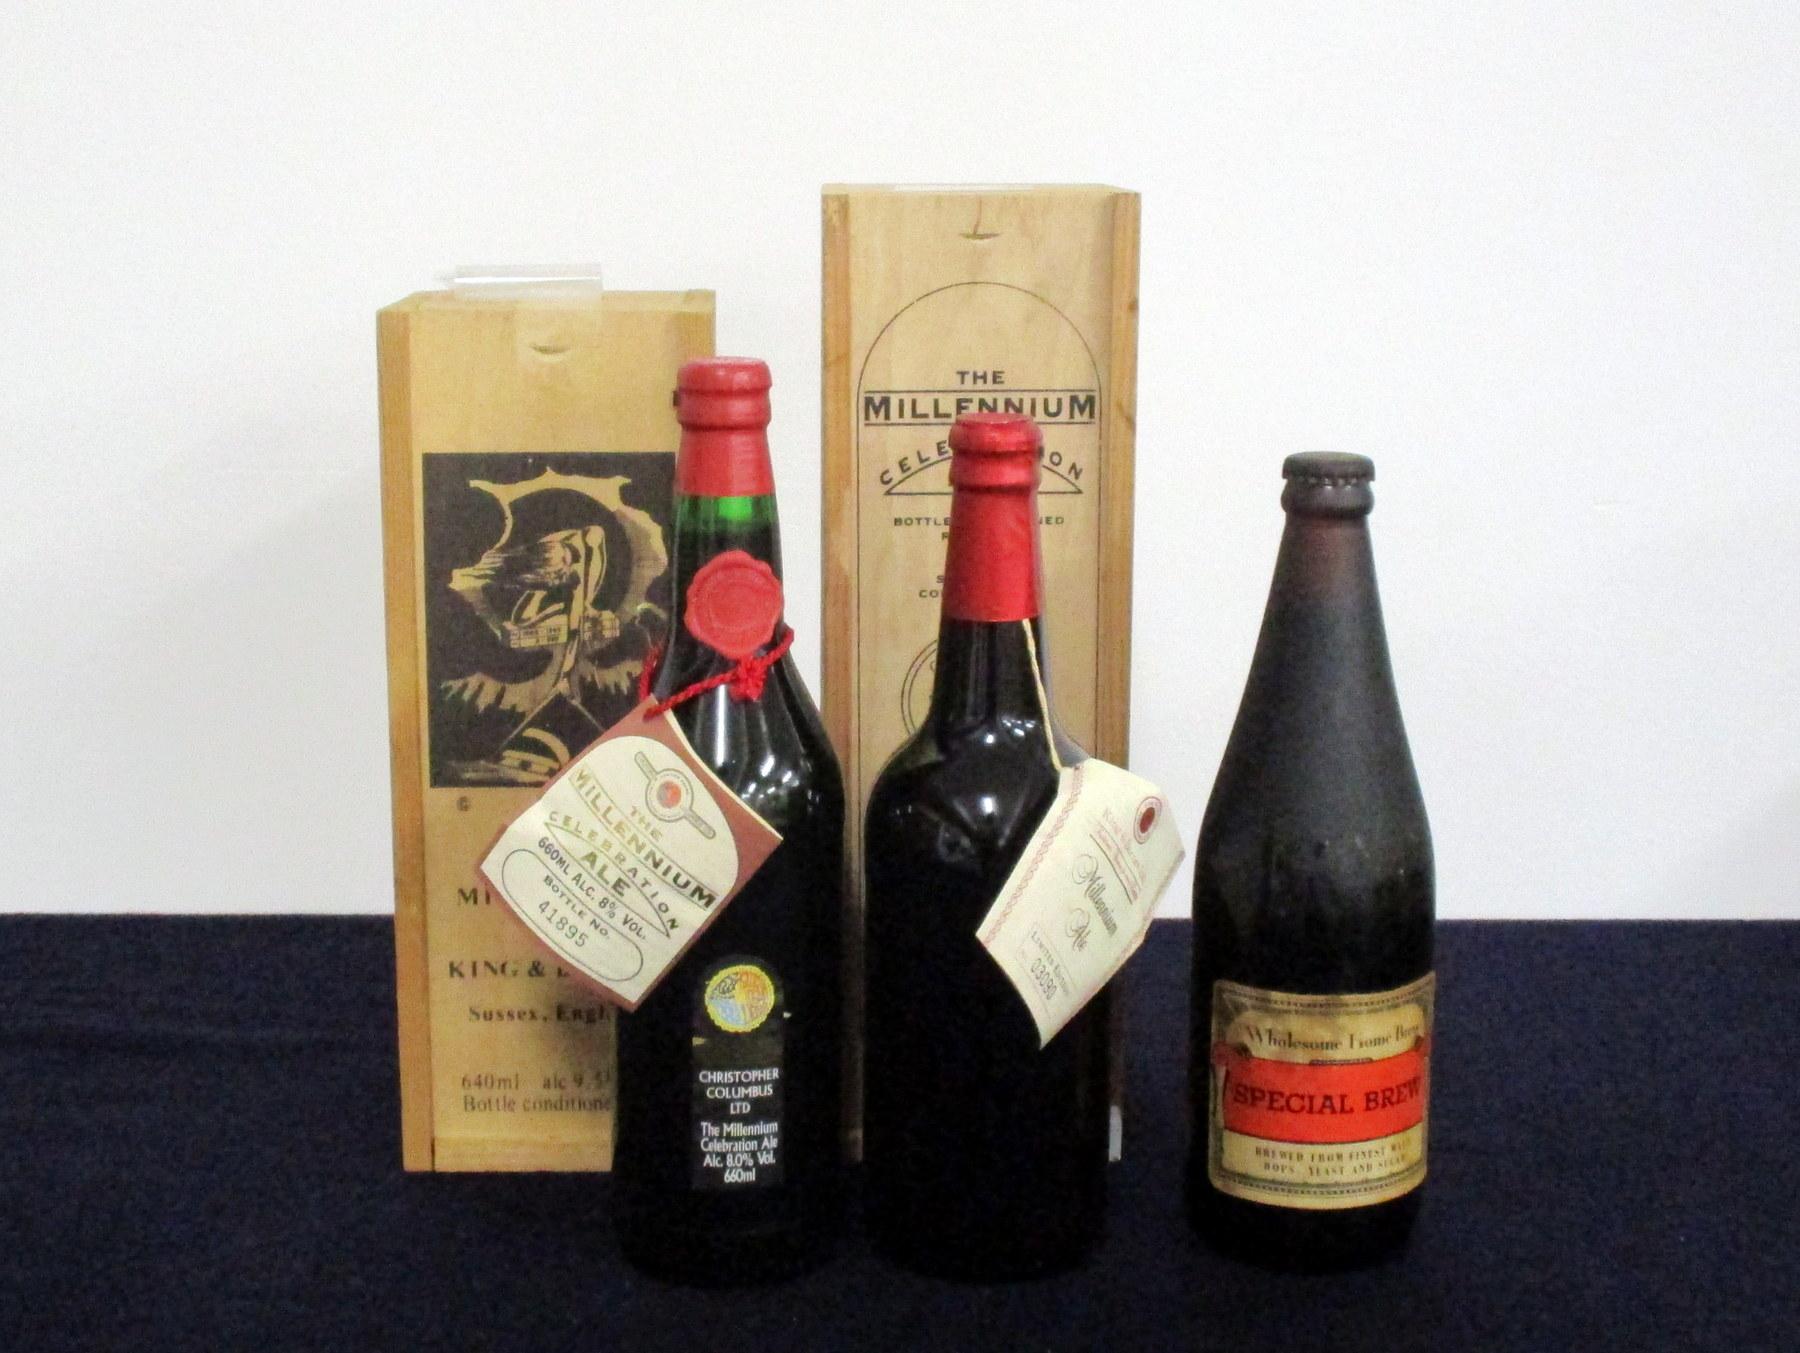 1 660 ml bt Christopher Colombus Ltd The Millennium Celebration Ale 8% in presentation case 1 660 ml